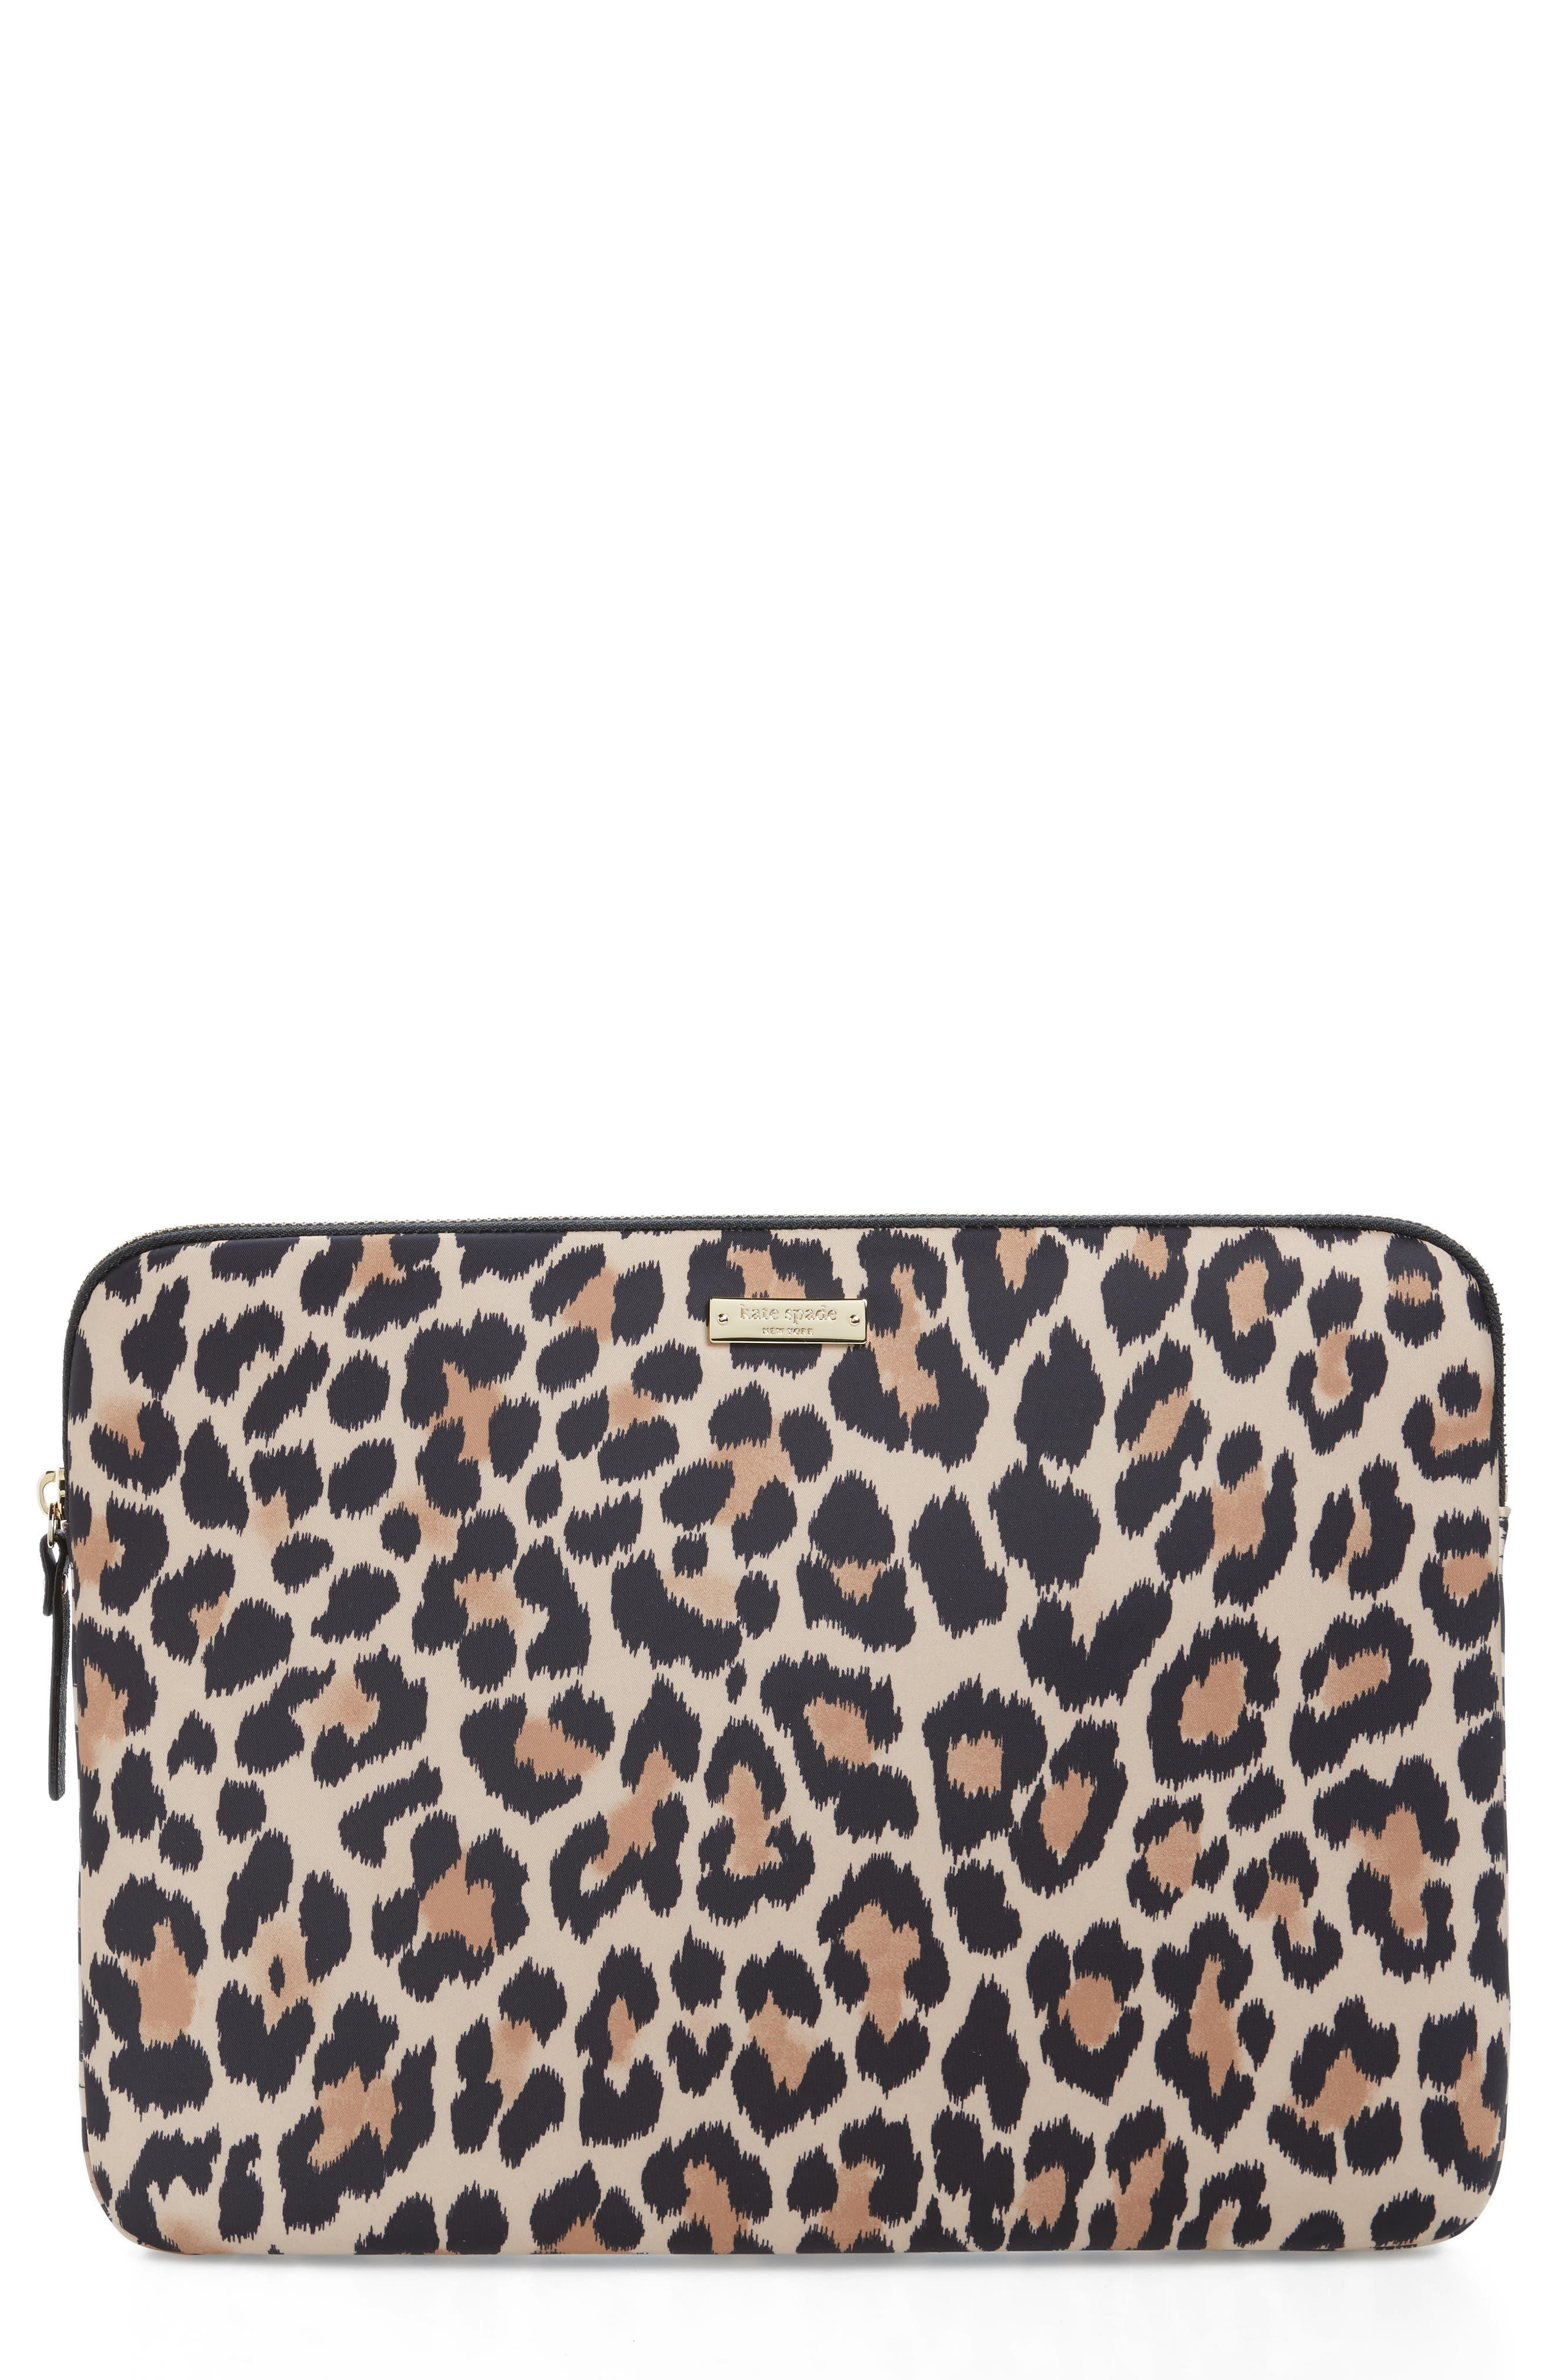 kate spade new york leopard 13-Inch laptop sleeve